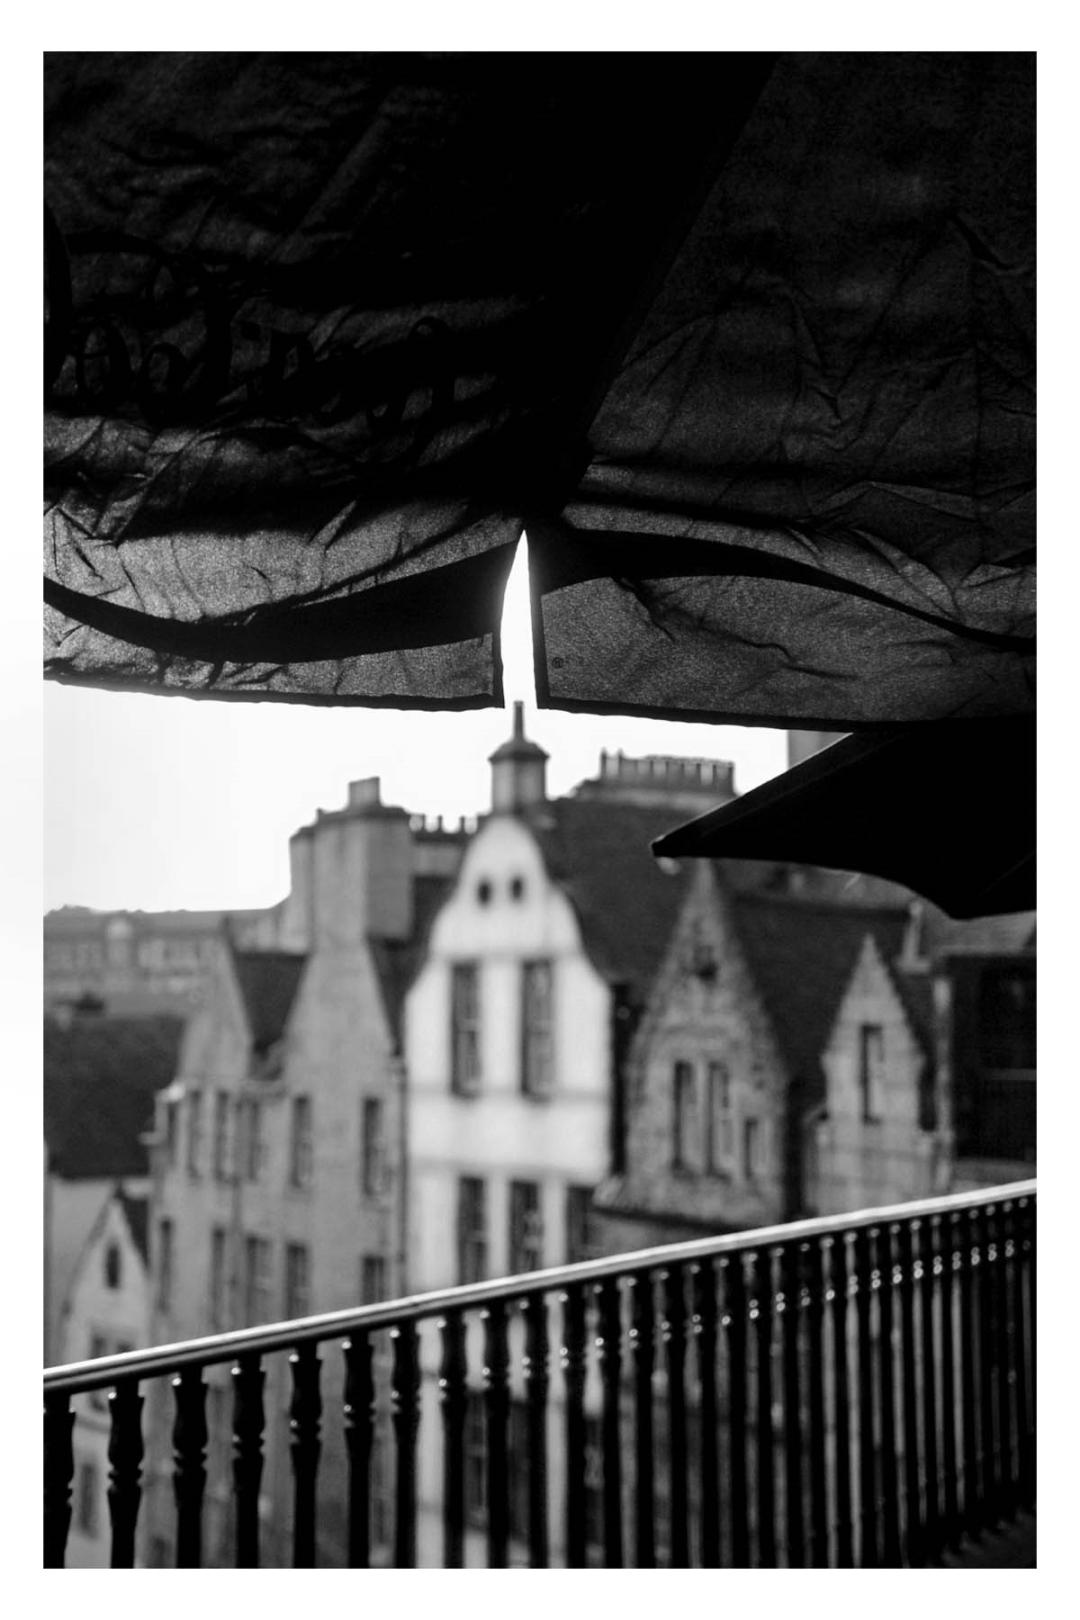 edinburghphotographytour03-59485.jpg